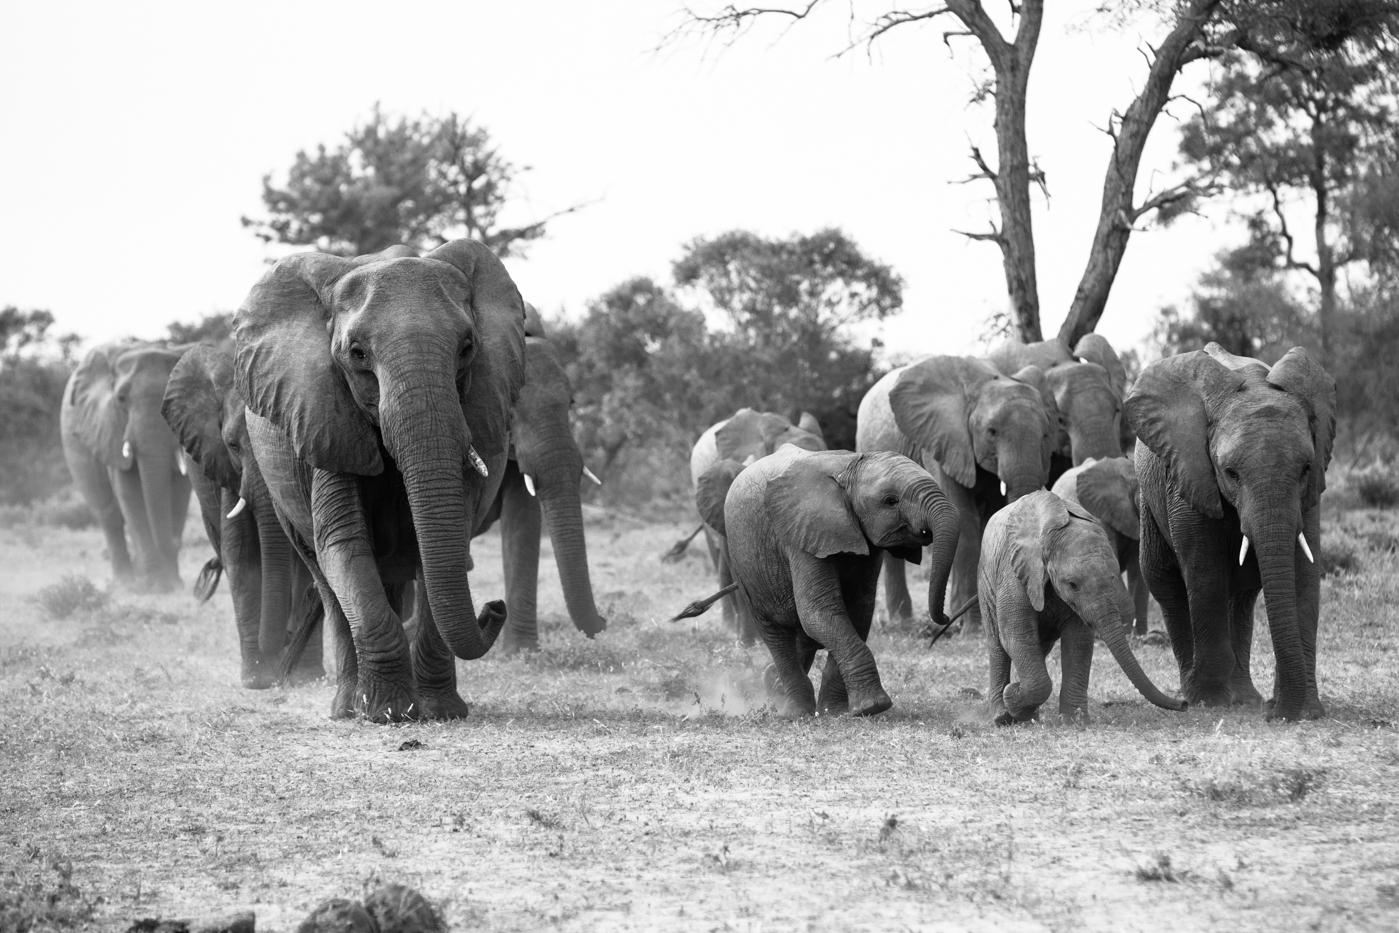 Elephant Herd black and white